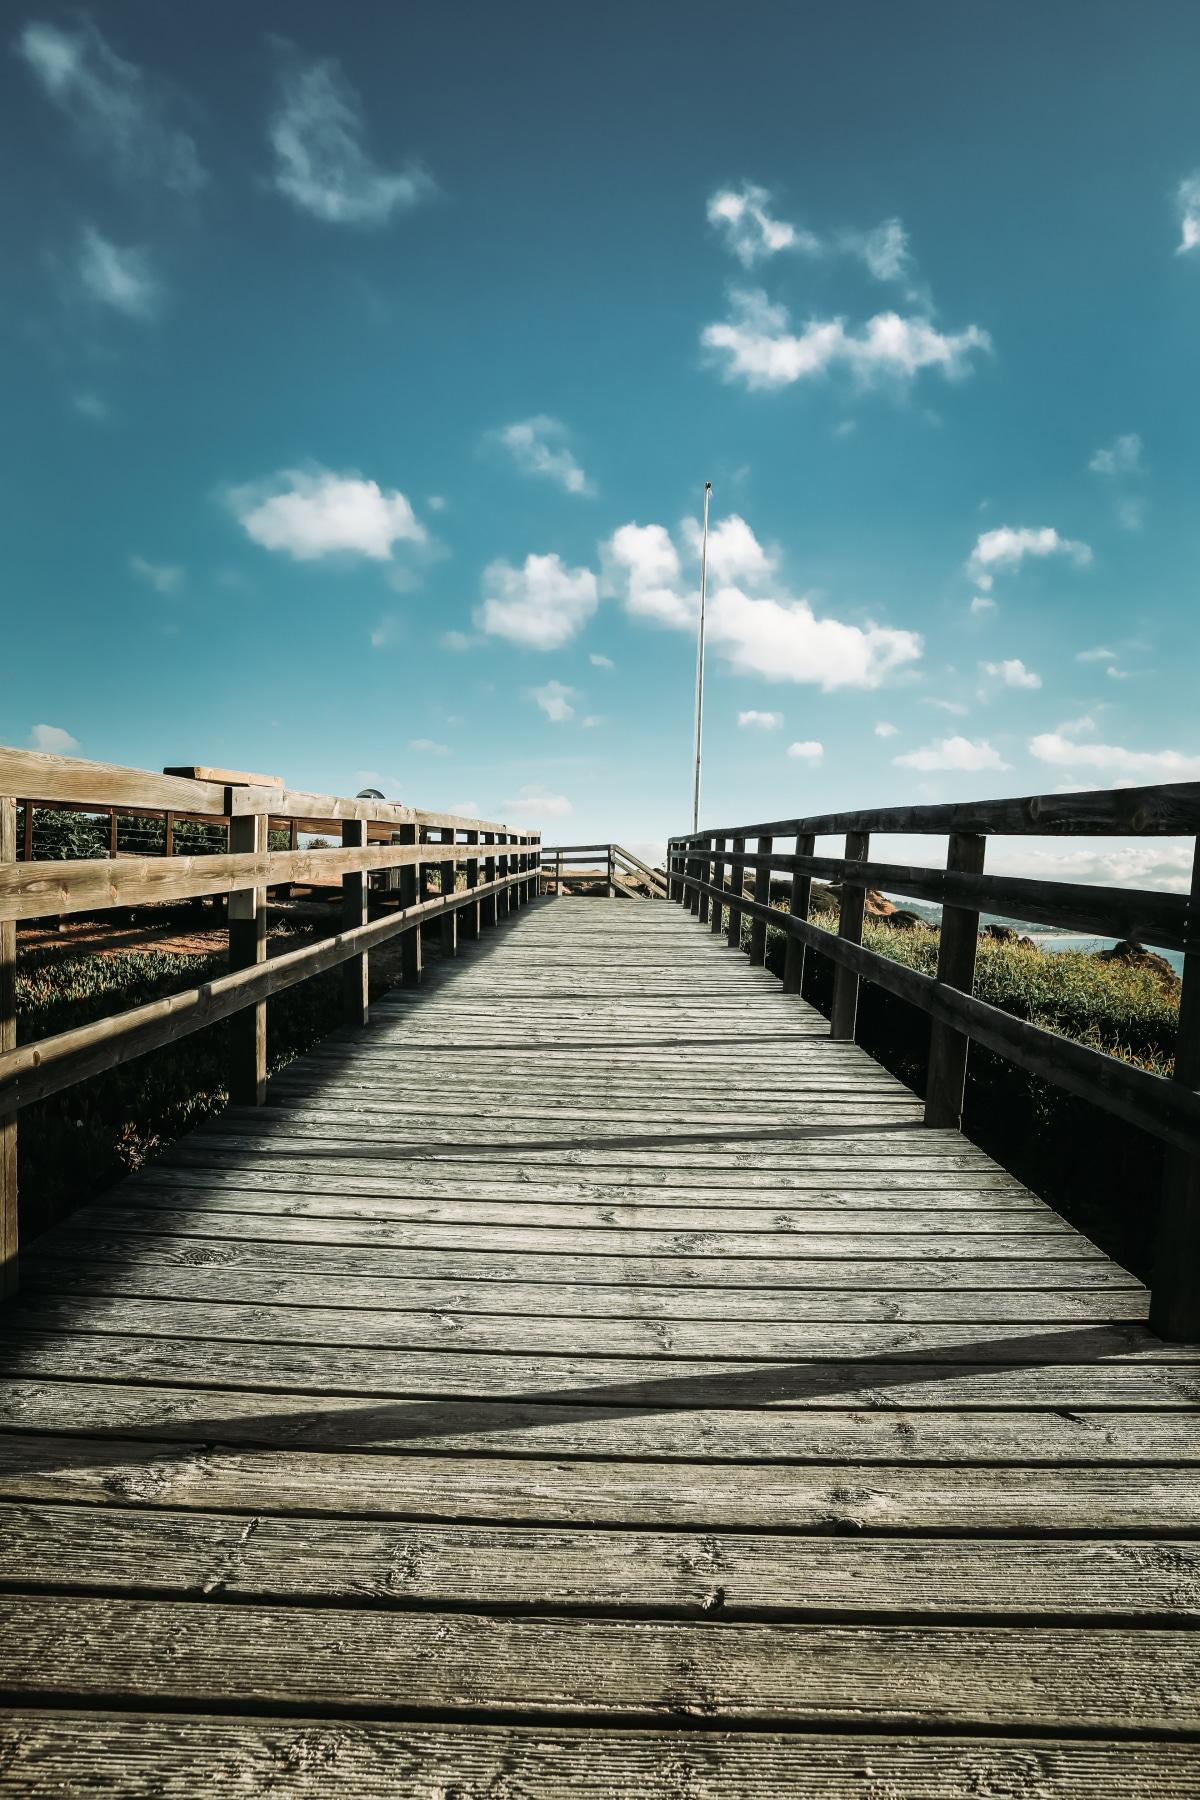 The start of the walkway down towards the Praia (Beach)